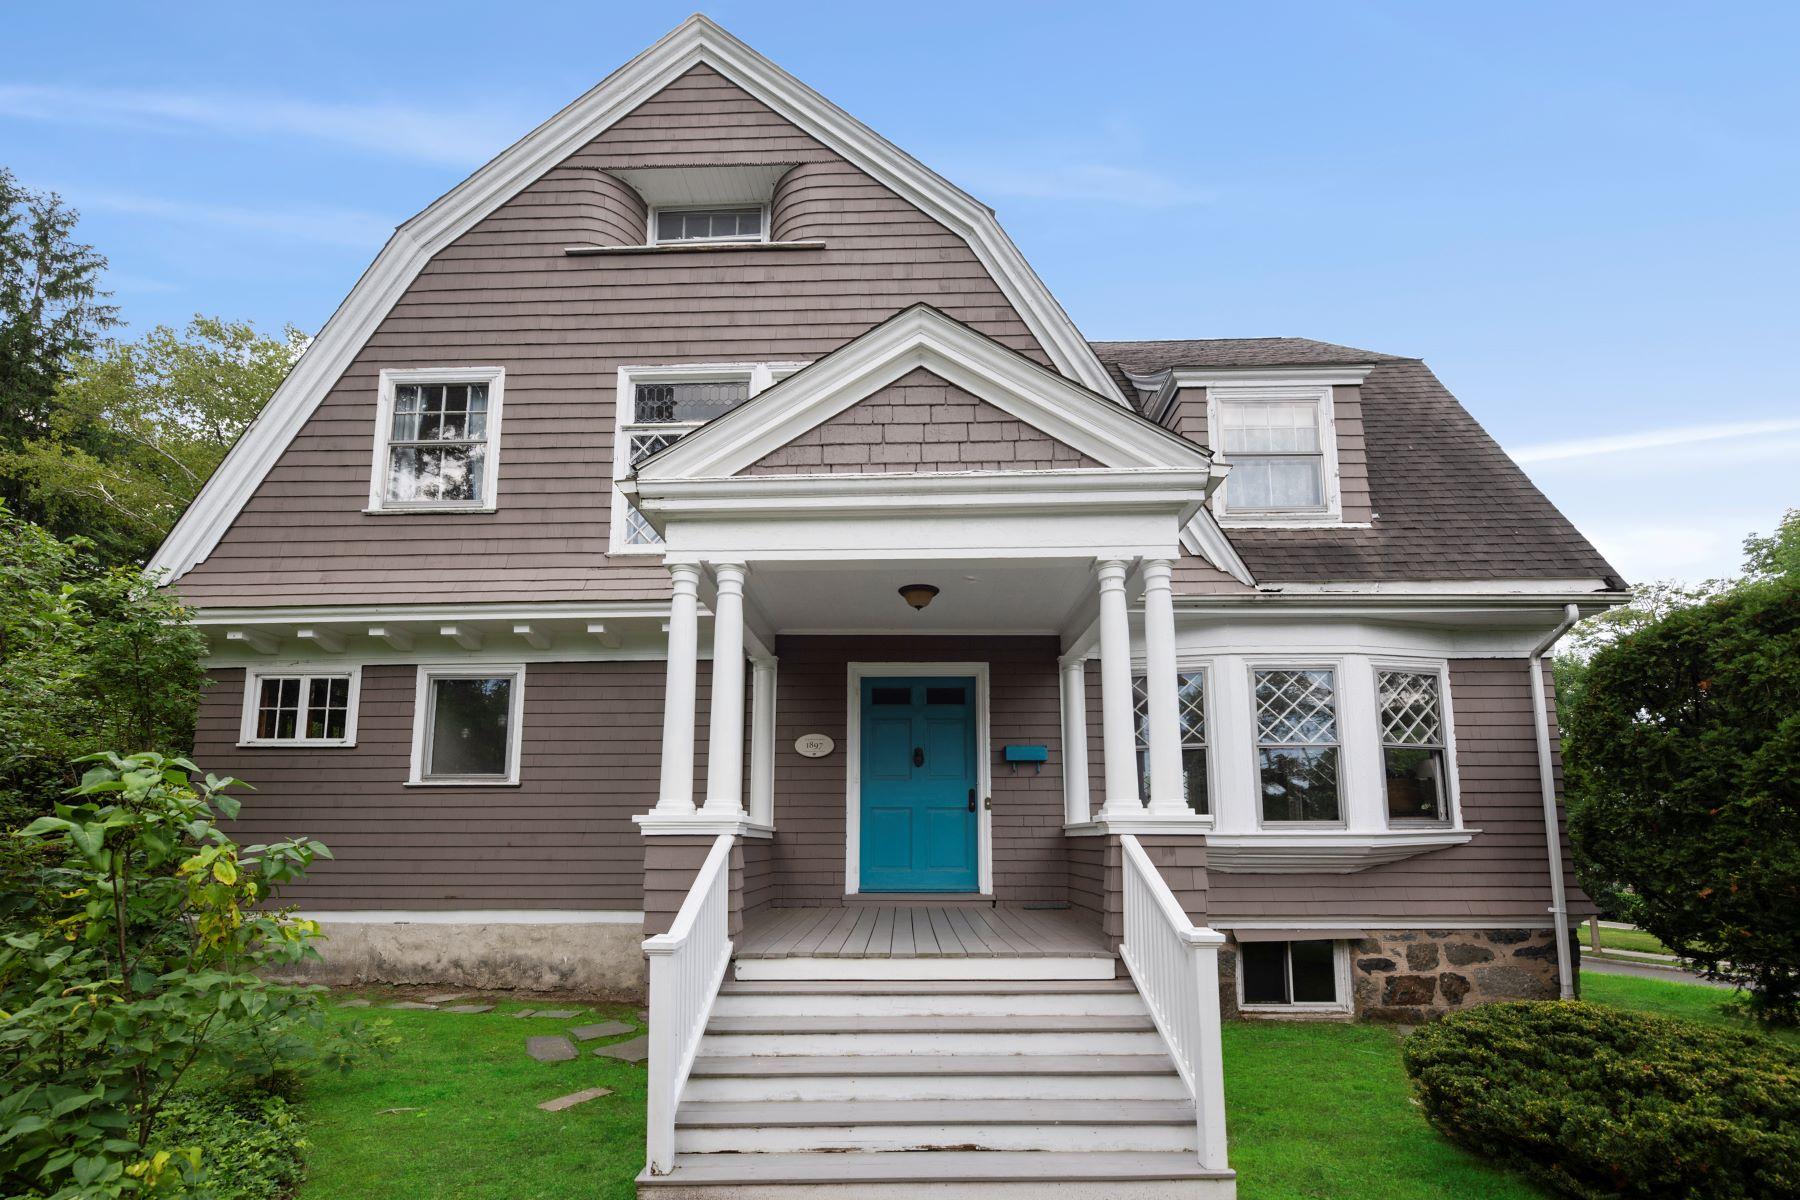 Single Family Homes 为 销售 在 1830 Commonwealth Ave 牛顿, 马萨诸塞州 02466 美国